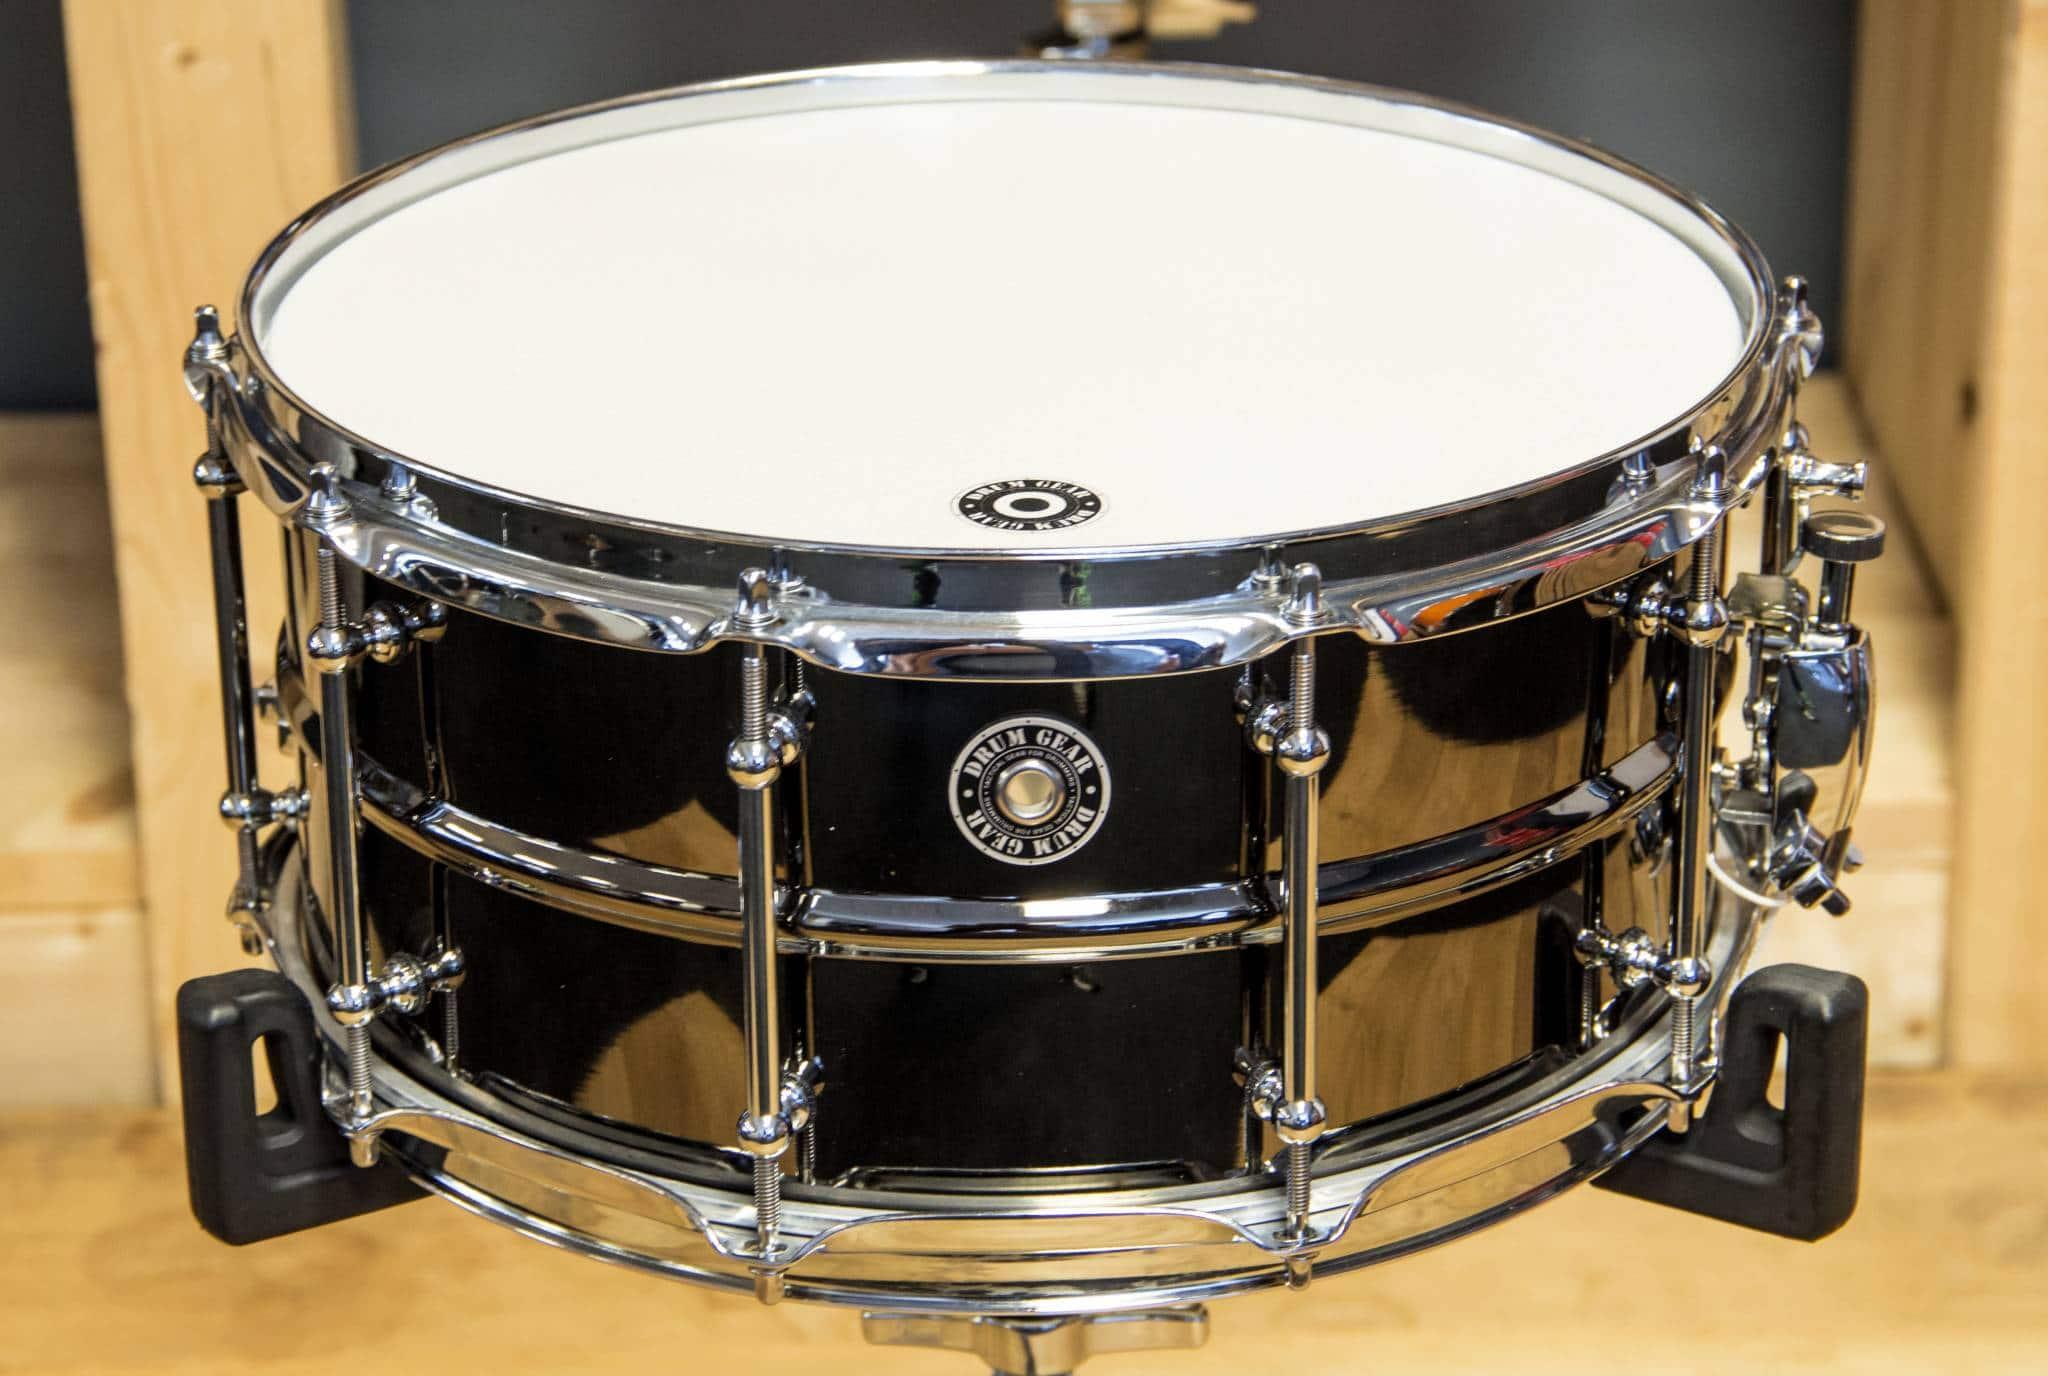 Drum Gear DGS B1465 SnareWorks MKII Brass snaredrum